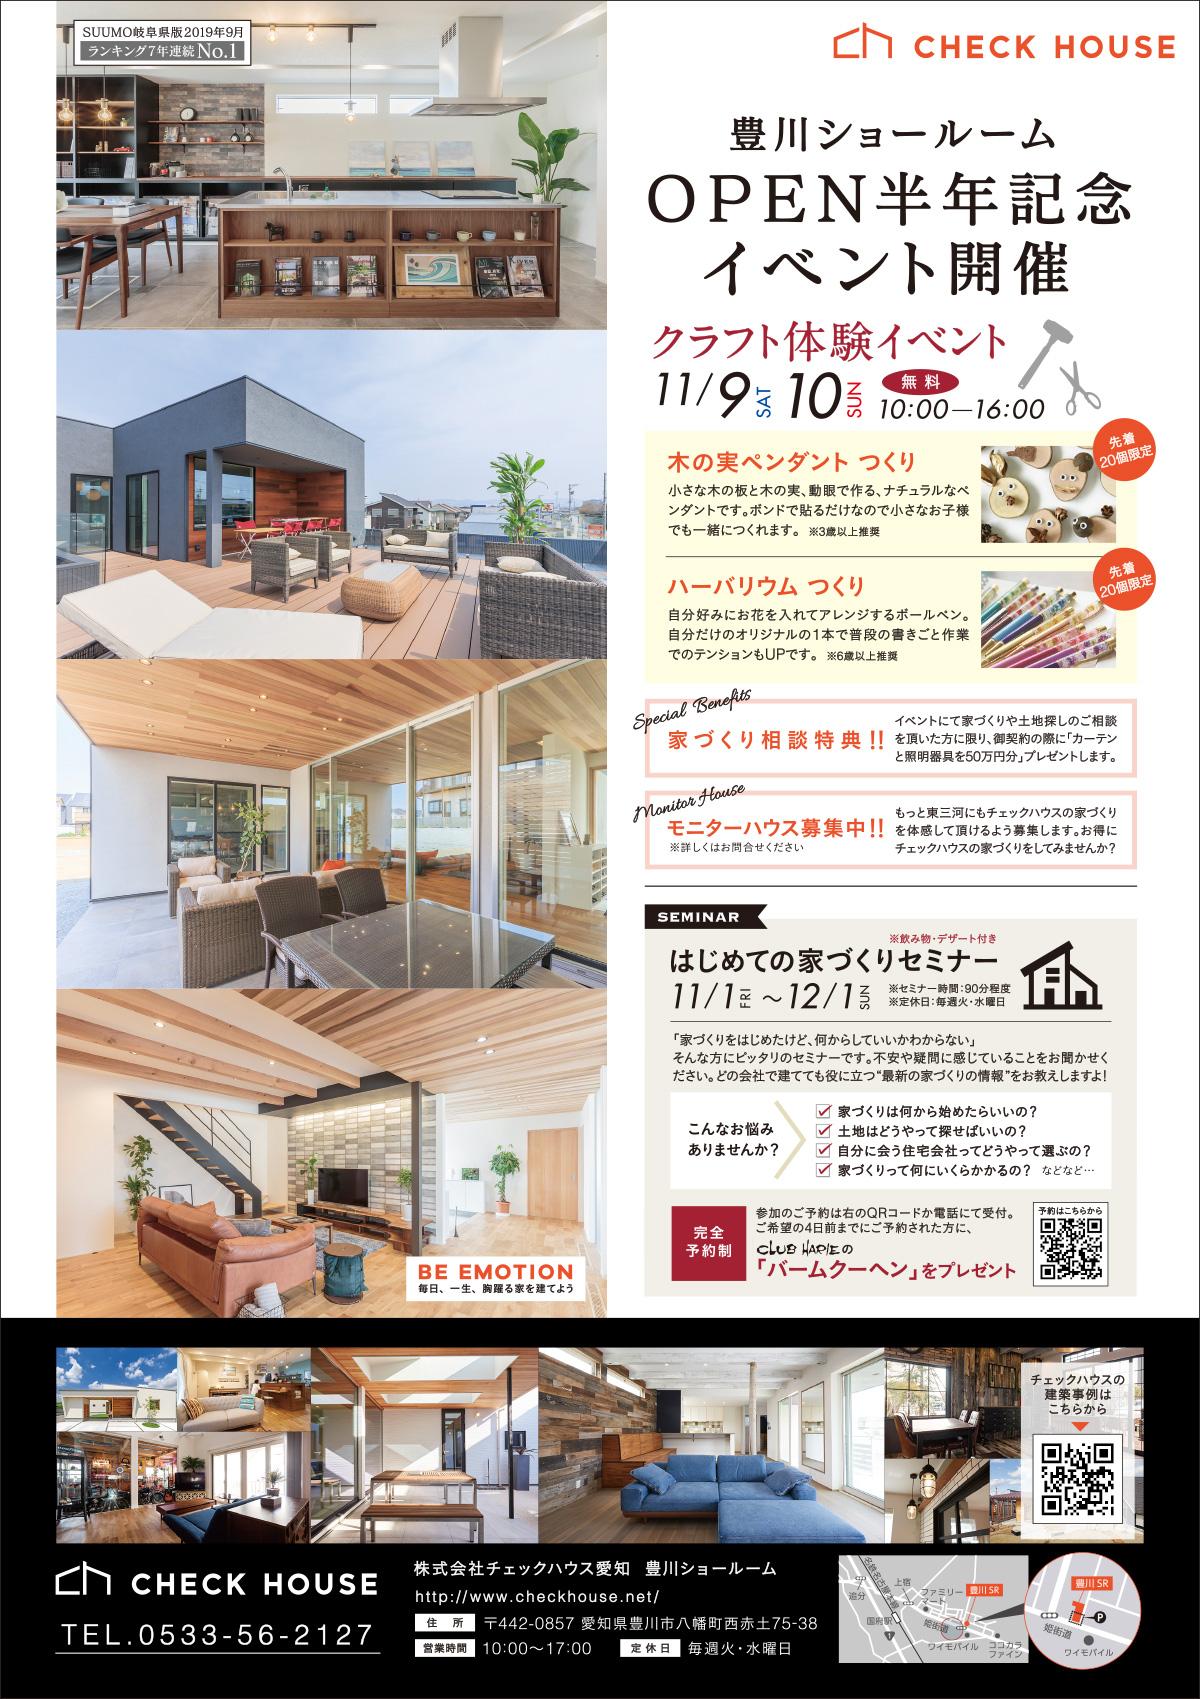 OPEN半年記念イベント in 豊川ショールーム <11/9・11/10>